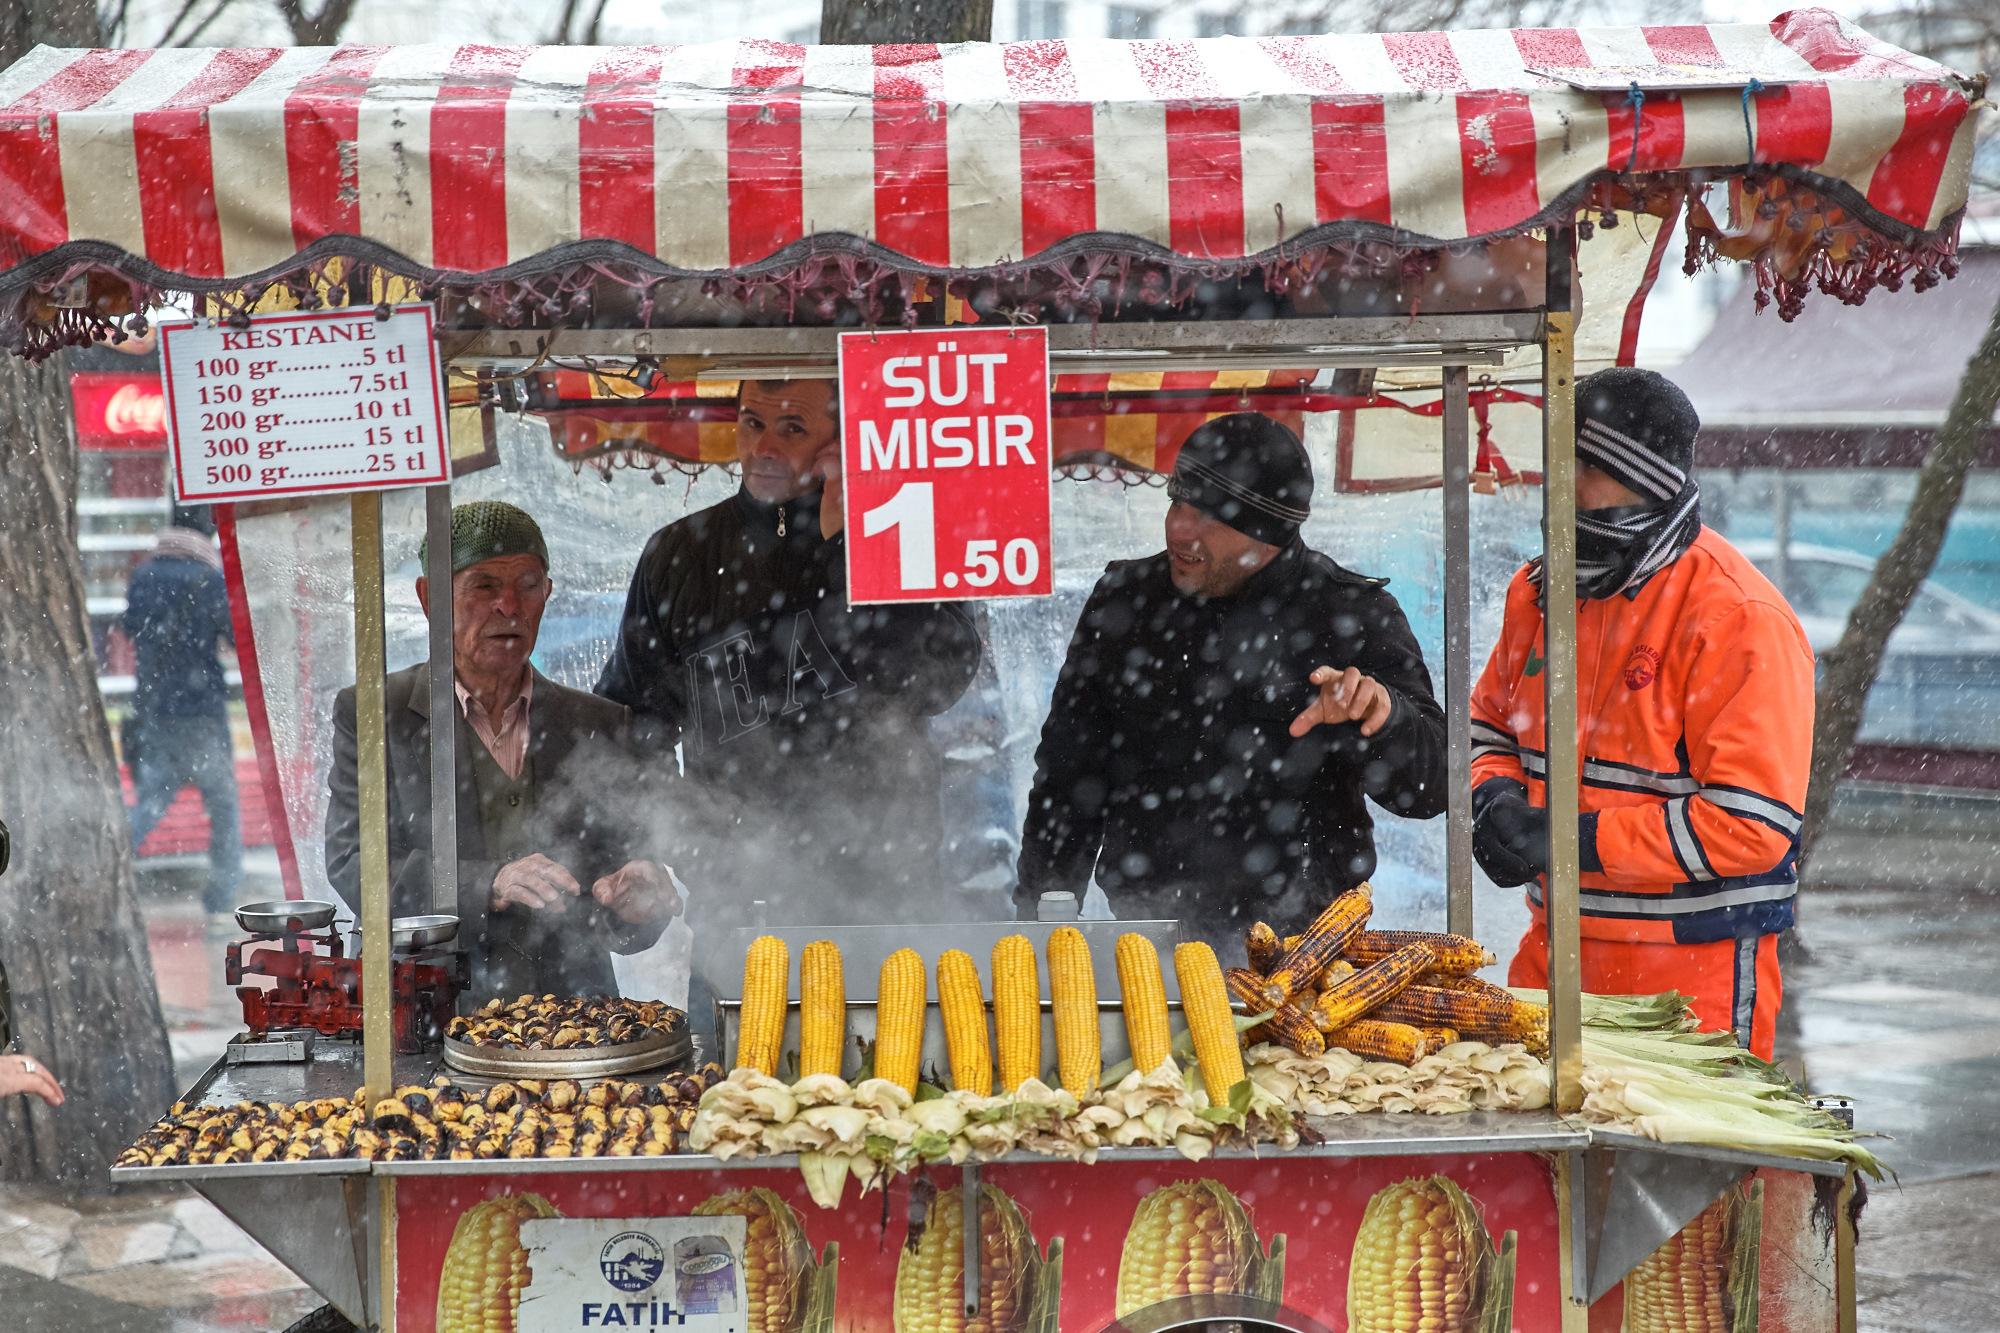 Istanbul_Grand_Bazaar-AudiMagazine-FinnBeales-05.jpg